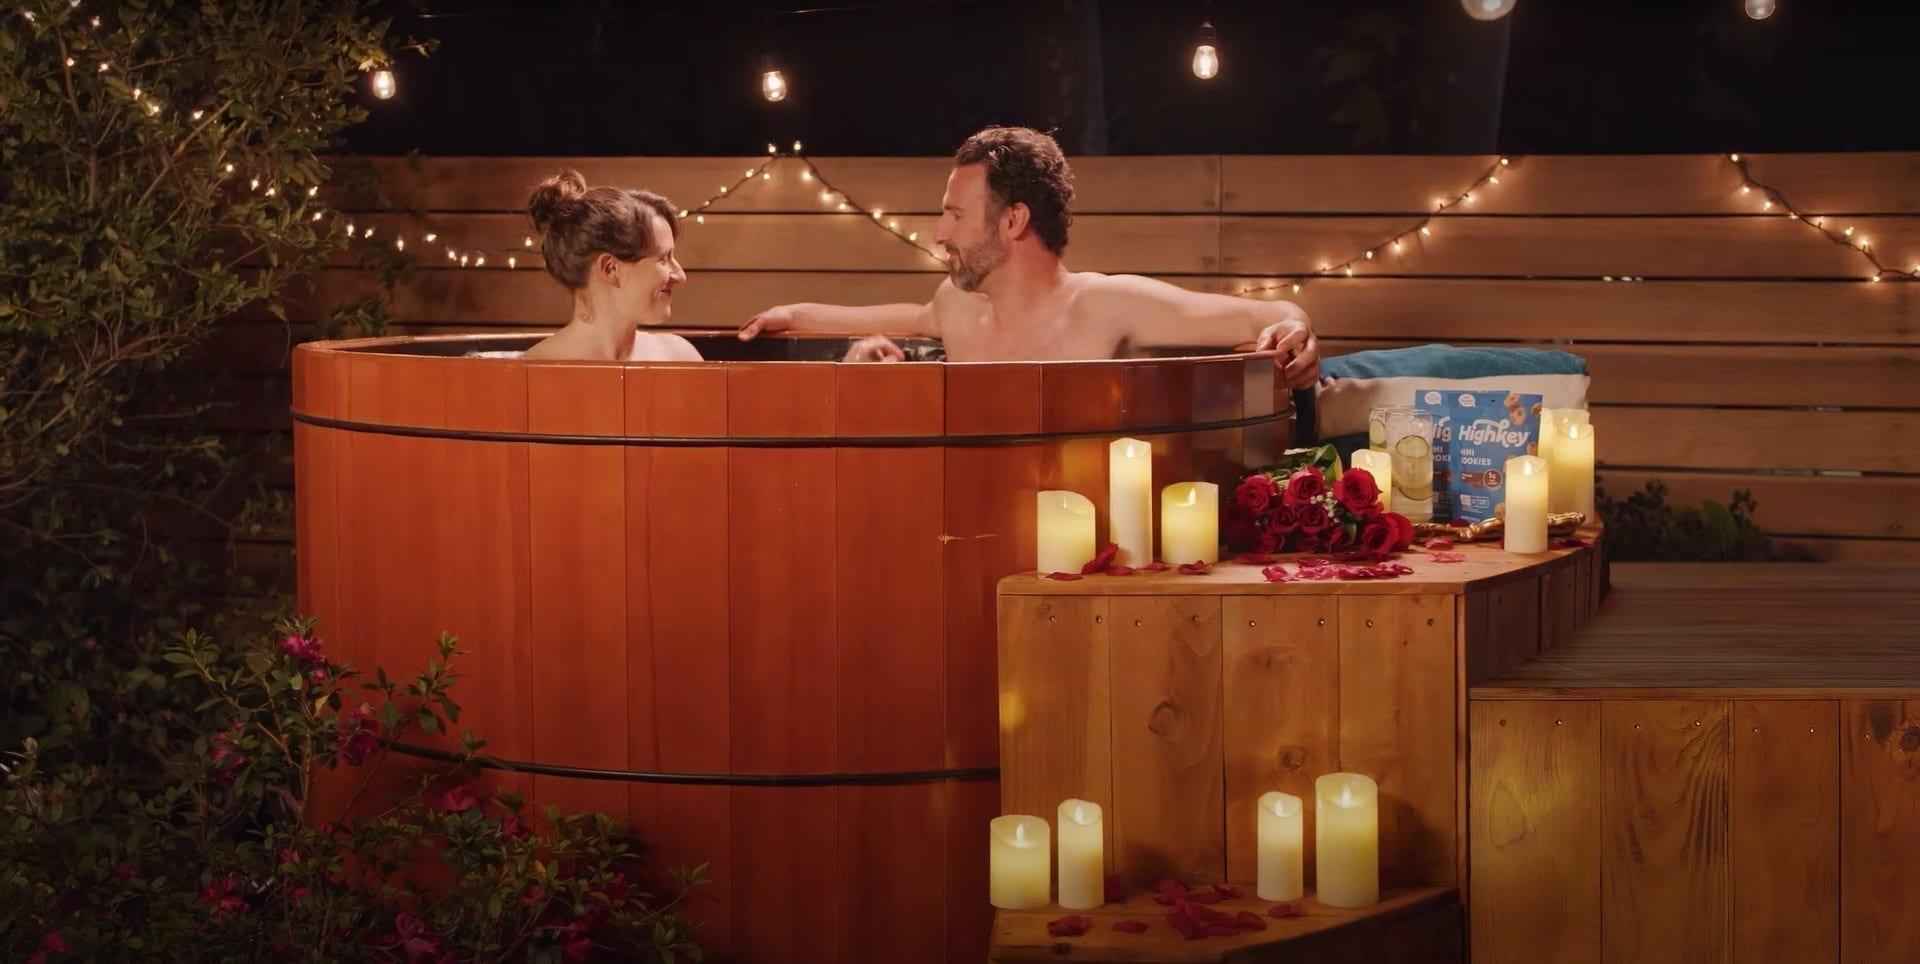 Sugar panda ad Ryan Reynolds